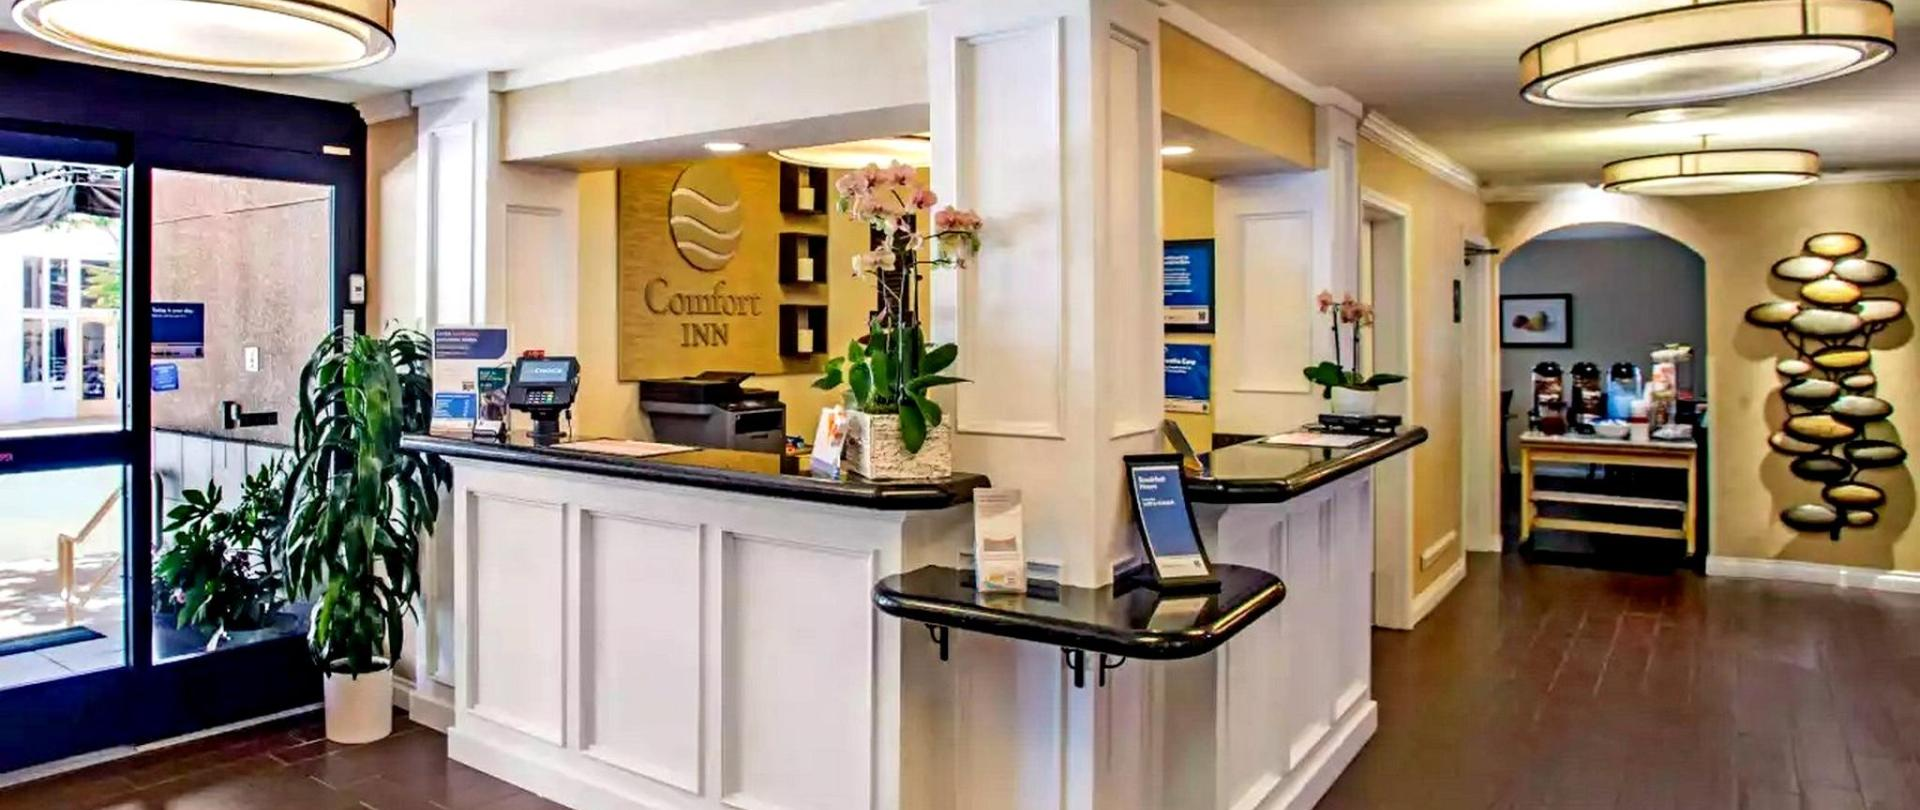 Comfort Inn Gaslamp Convention Center.jpg